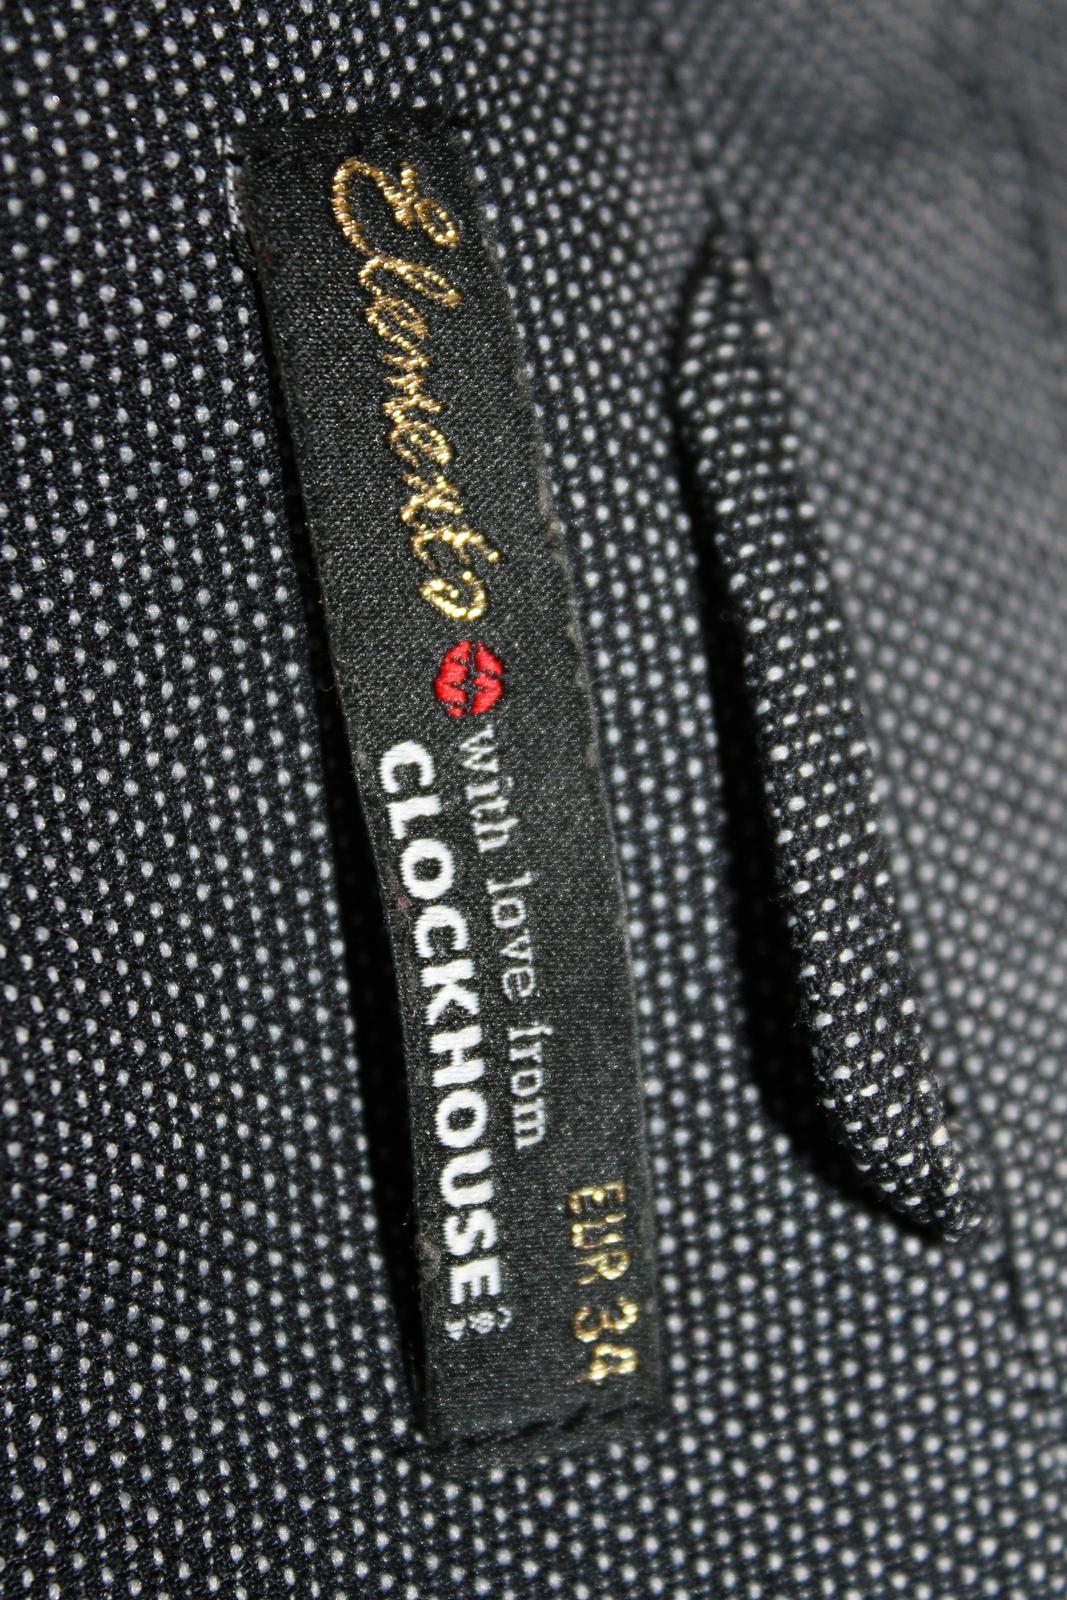 Elegantné sako zn. Clockhouse - Obrázok č. 4